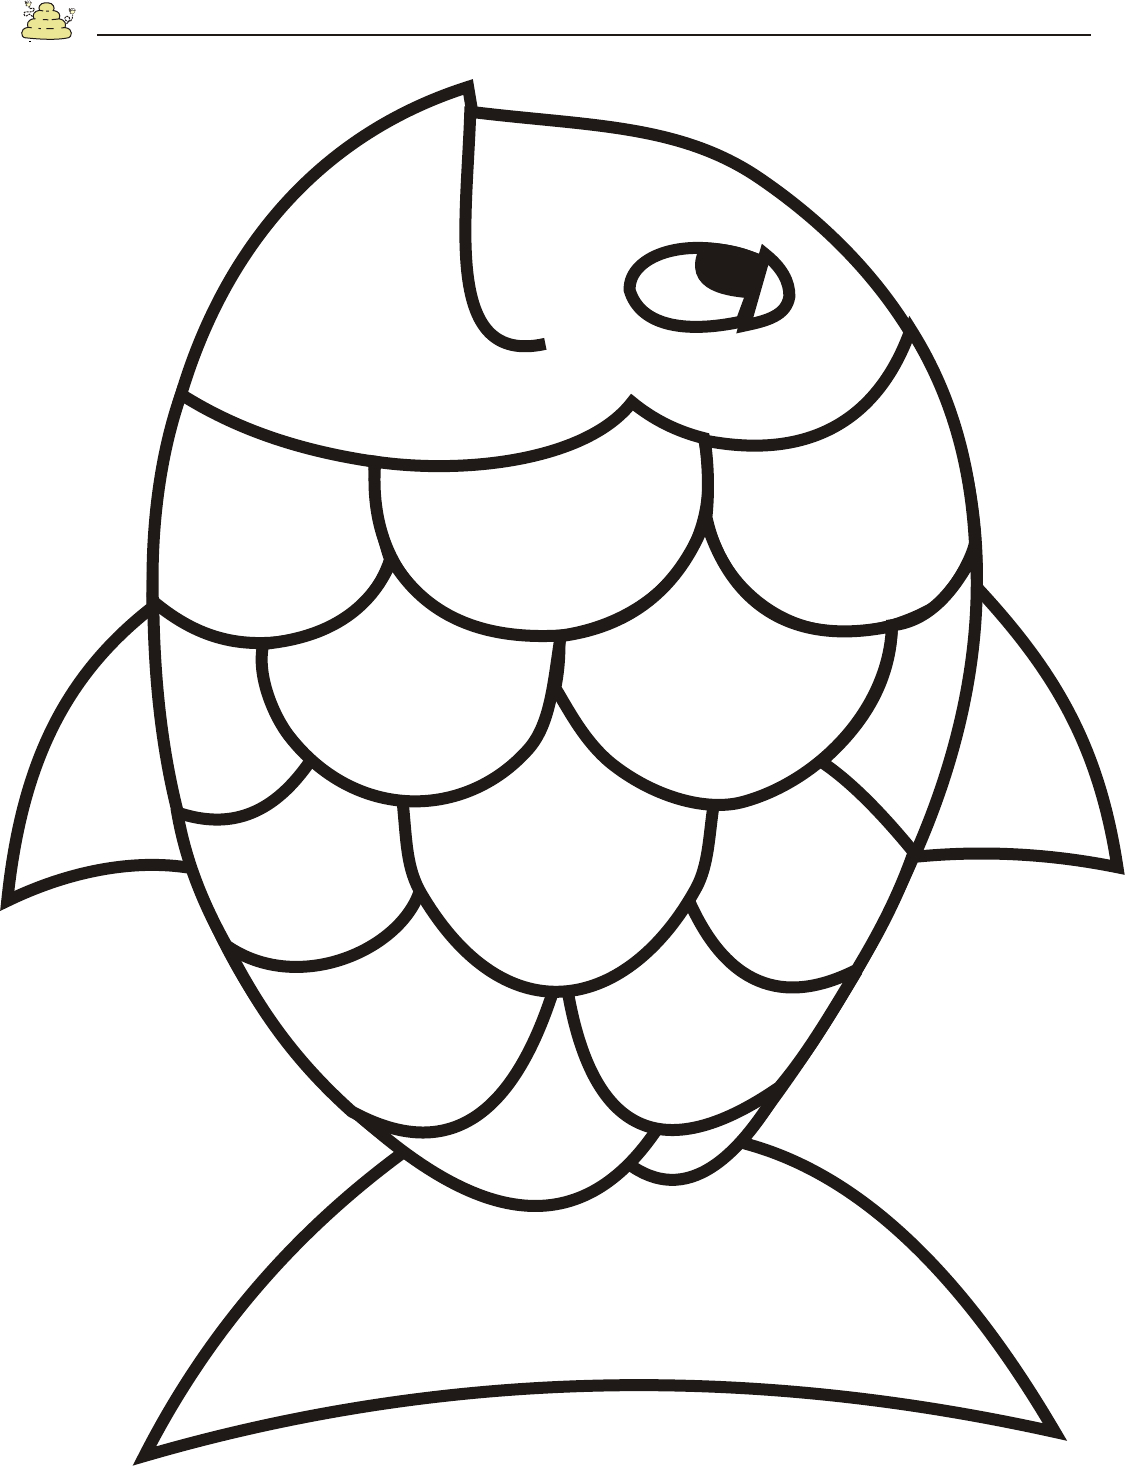 Free Rainbow Fish Template - Pdf | 2 Page(S) | Page 2 | Vbs - Free Printable Fish Stencils